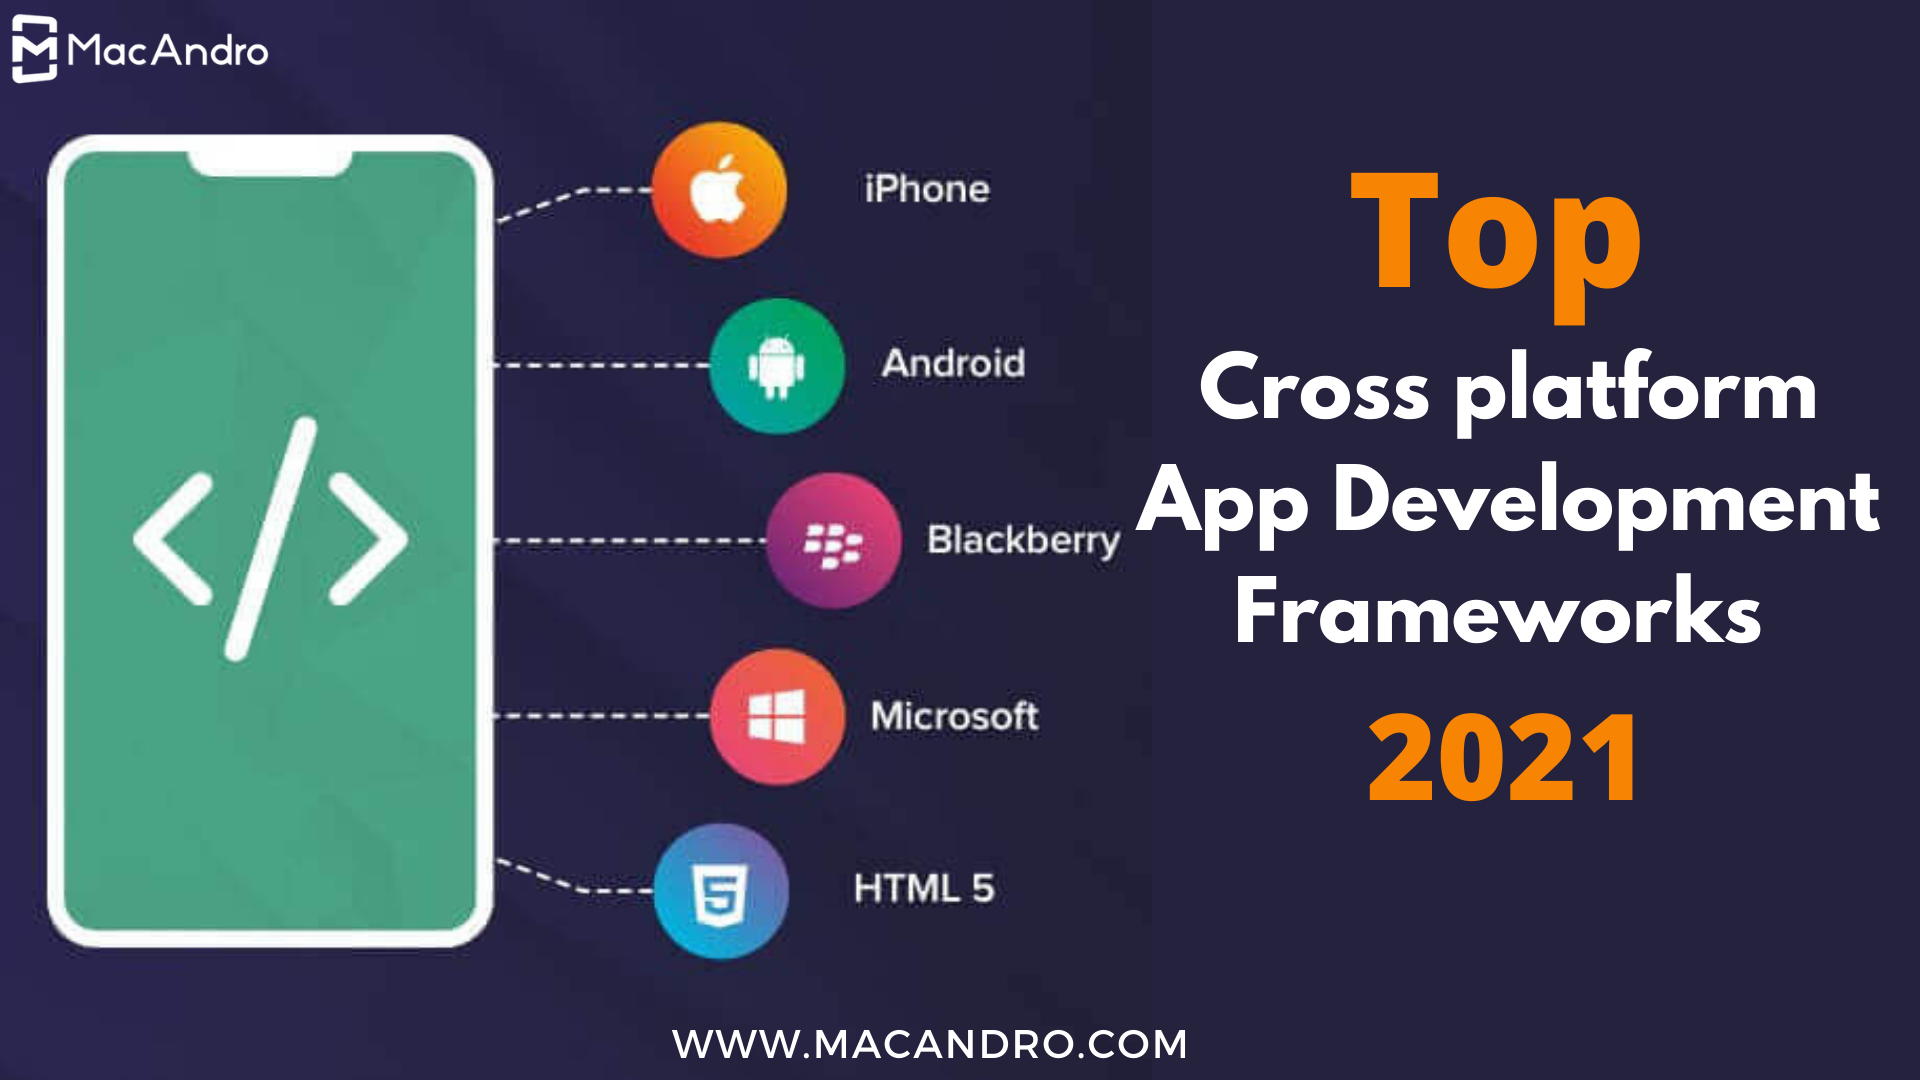 Top 10 Cross Platform Mobile App Development Frameworks 2021